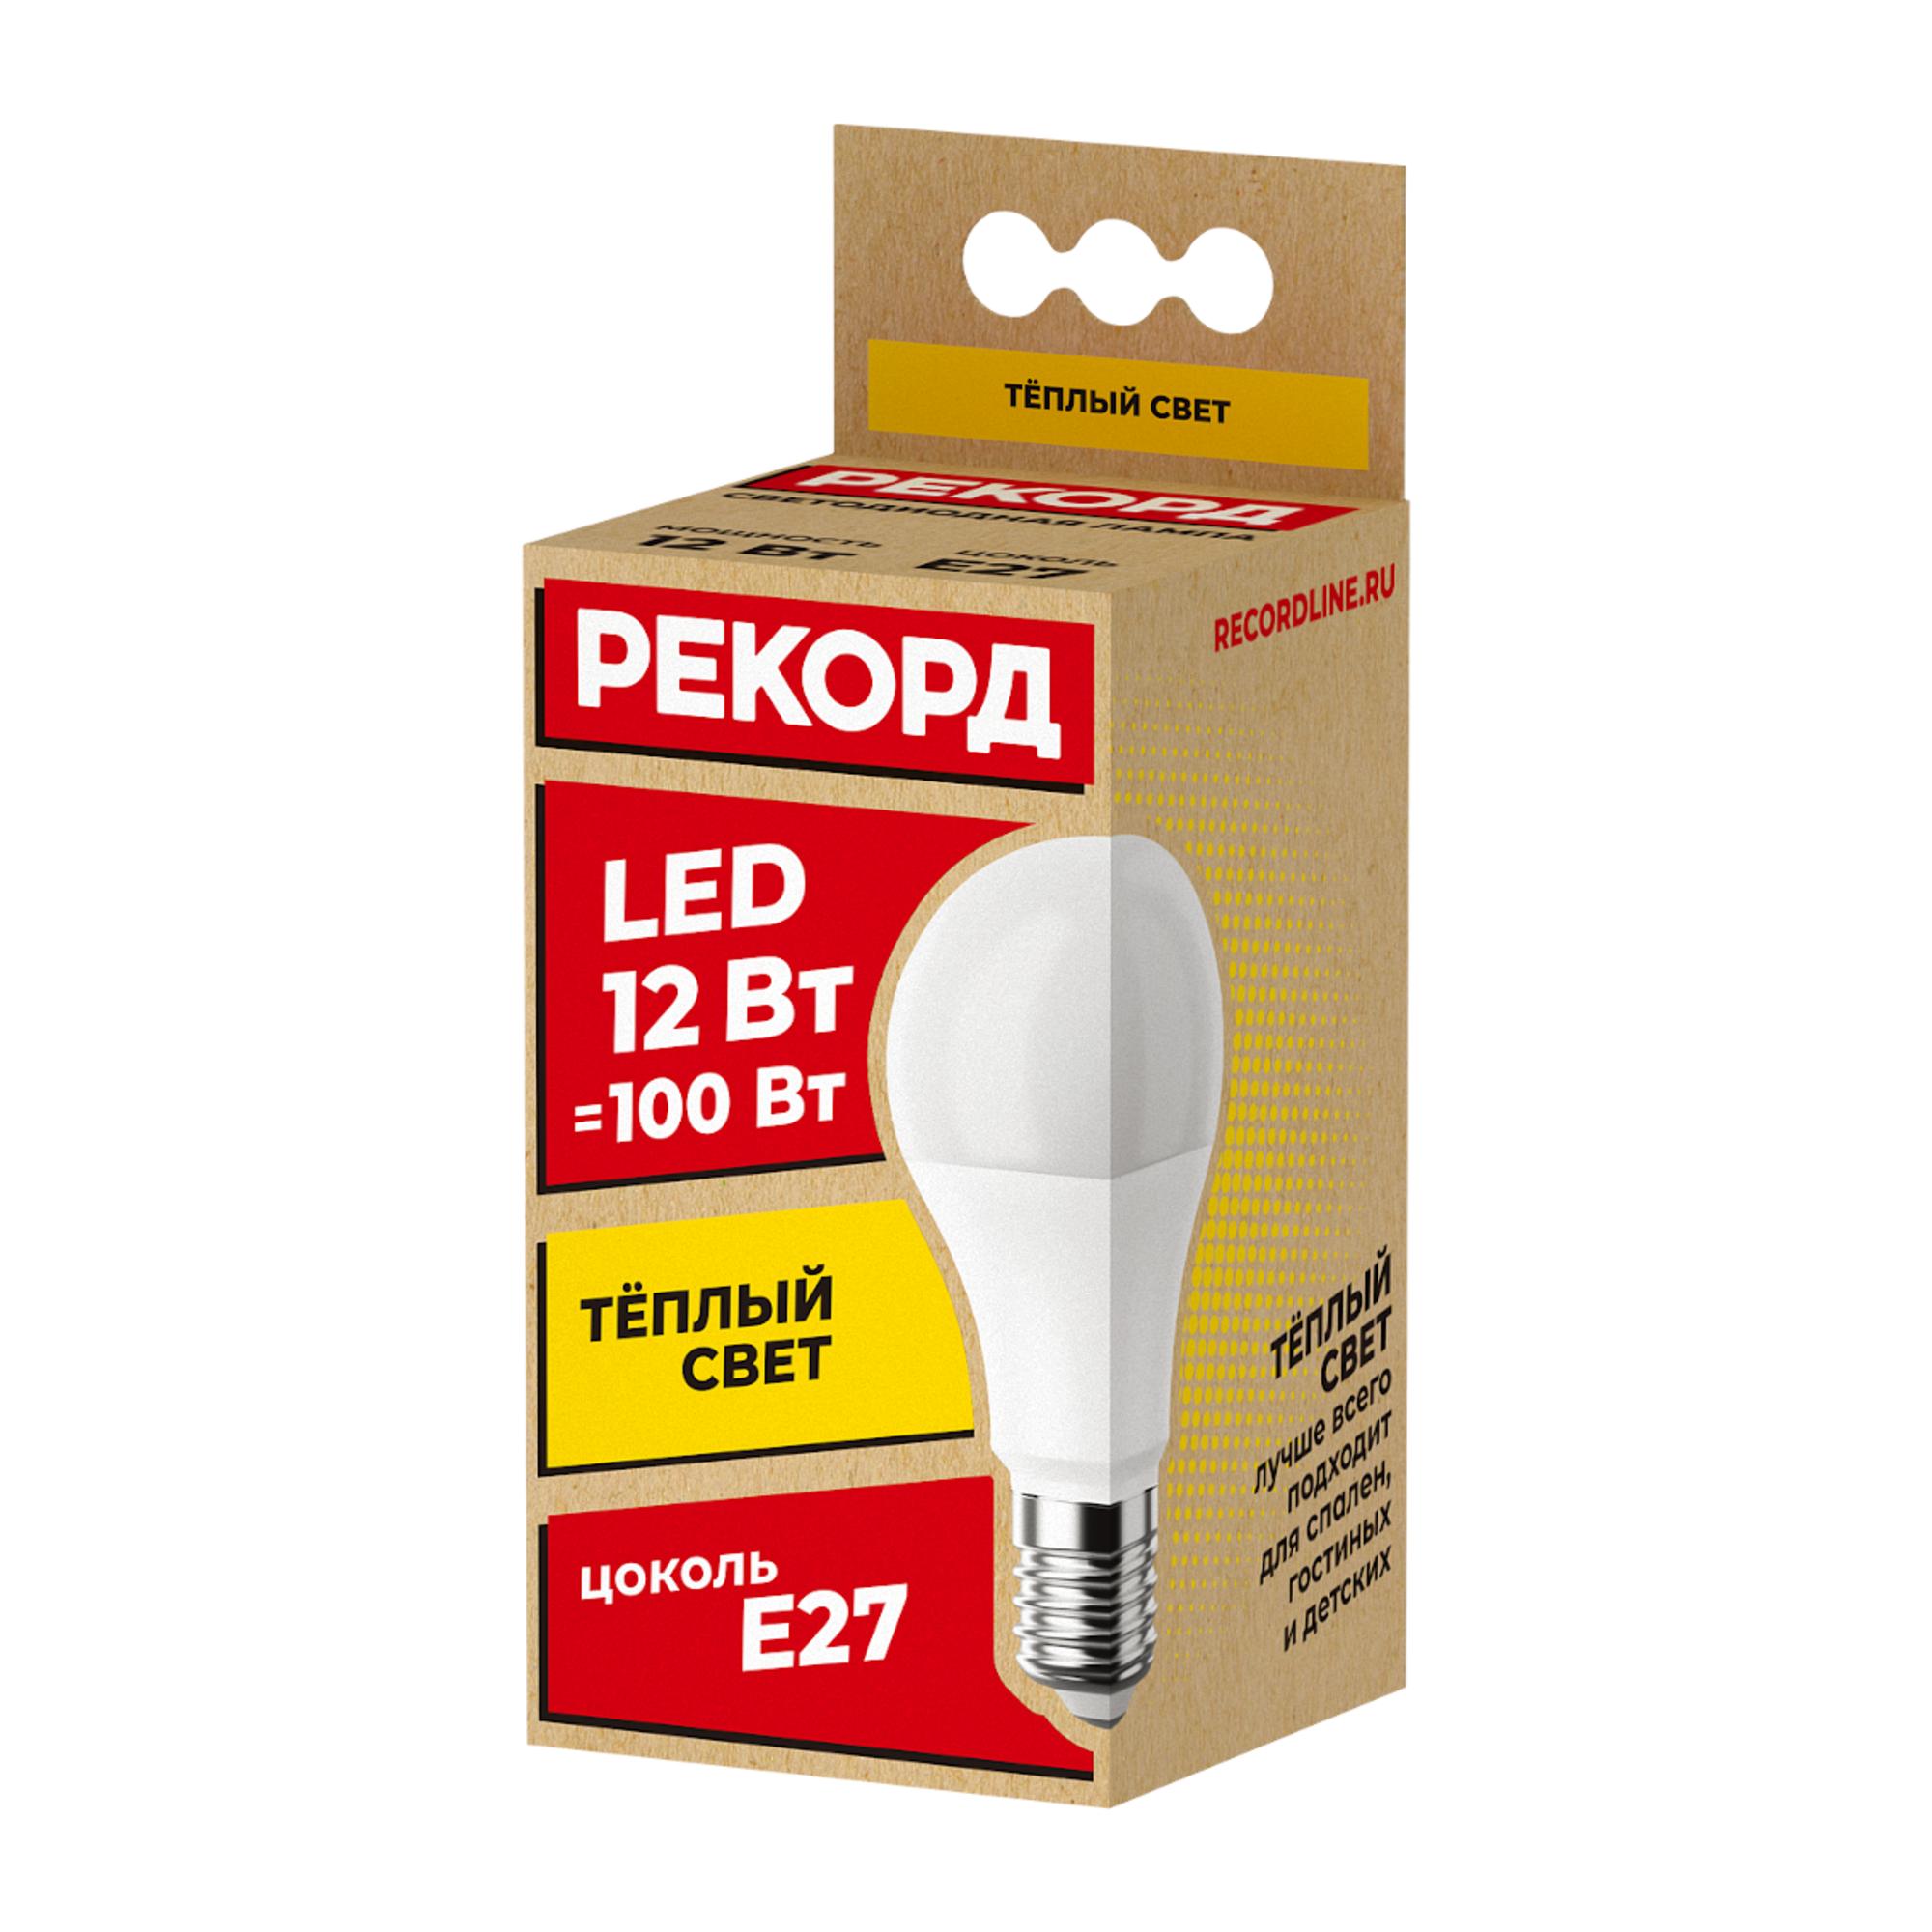 Светодиодная лампочка Рекорд 23877 E27 120 Лм 12 Вт